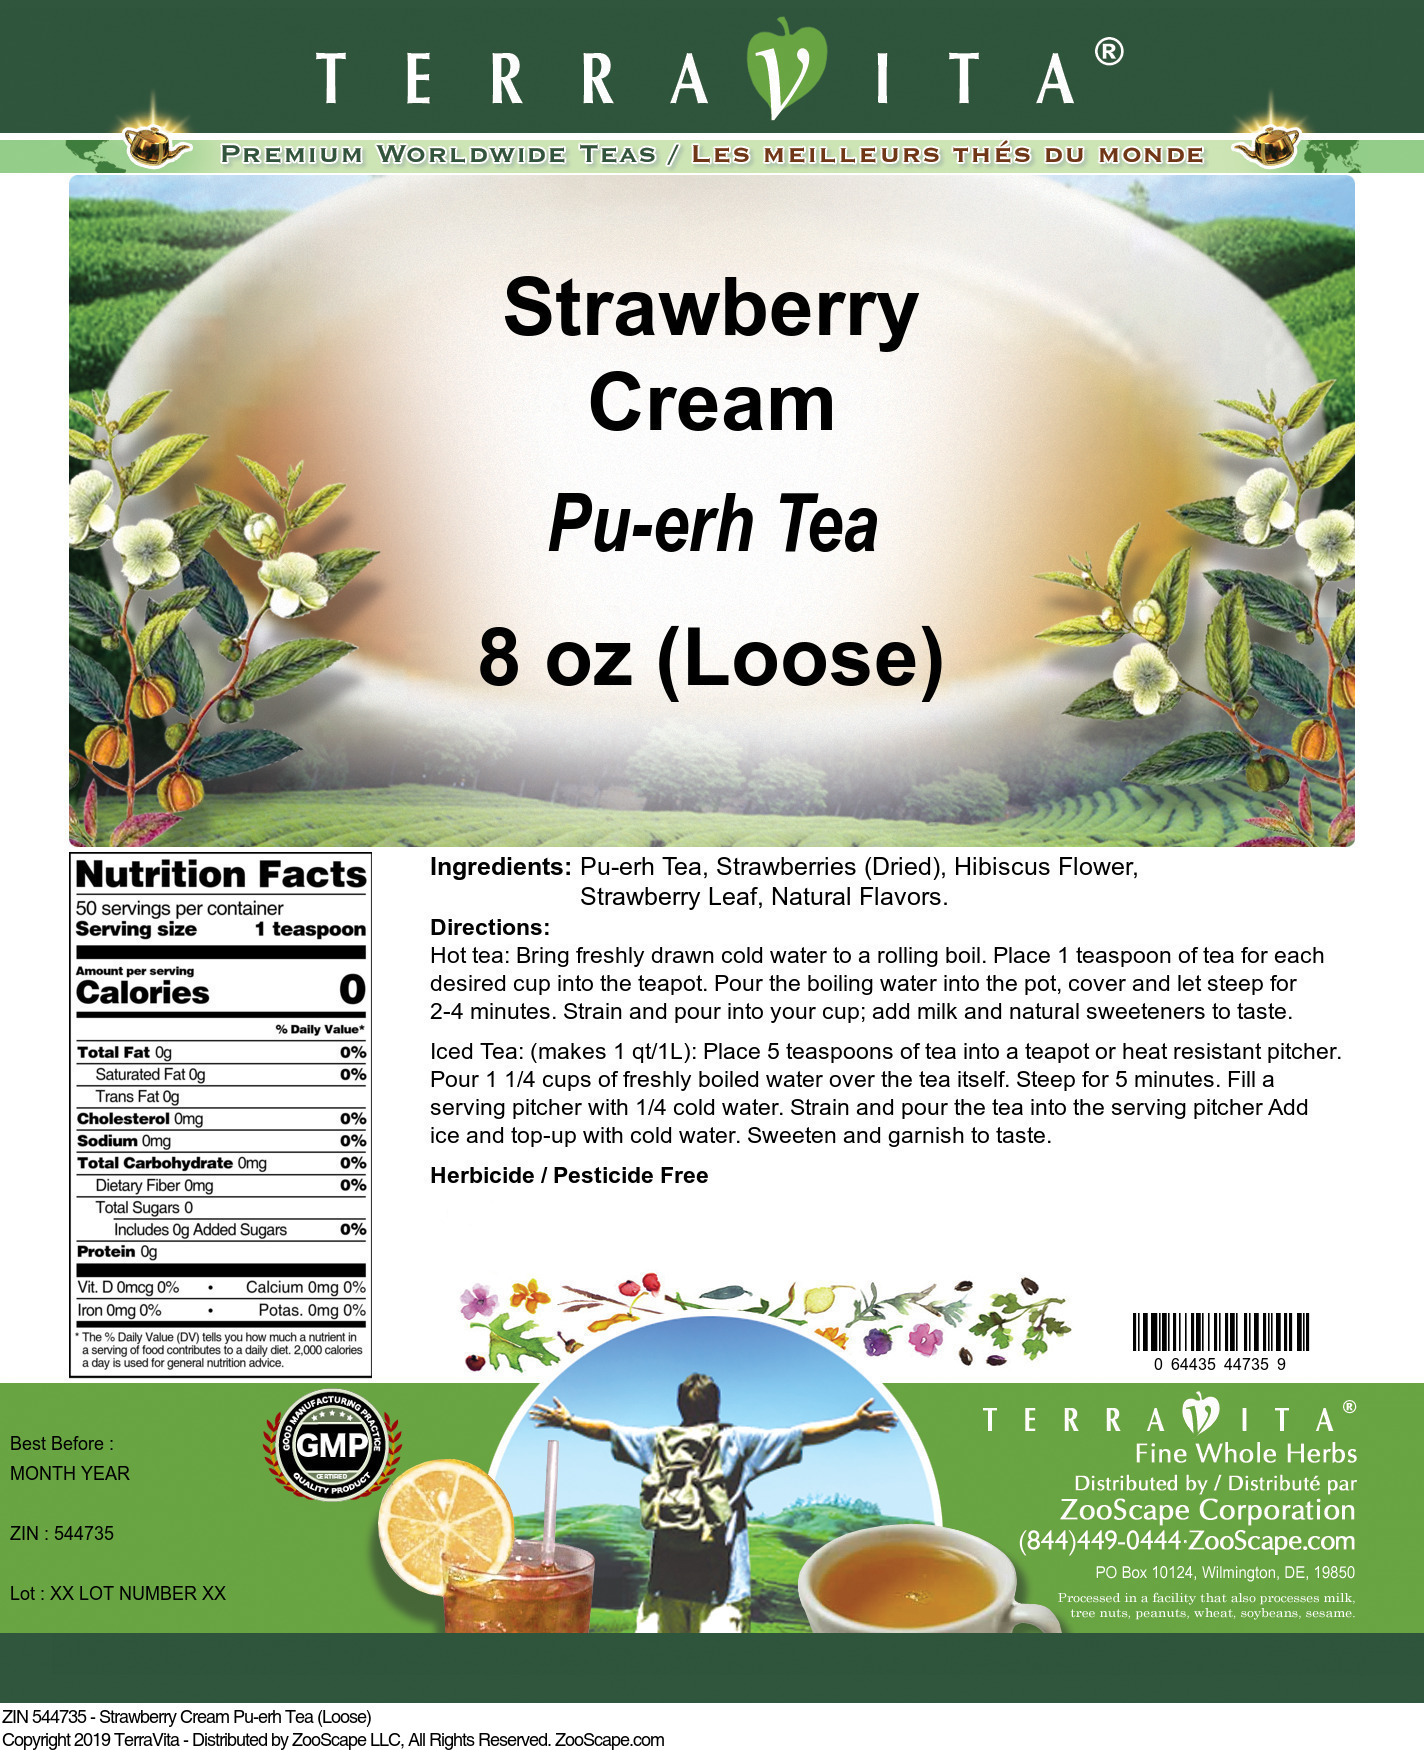 Strawberry Cream Pu-erh Tea (Loose)